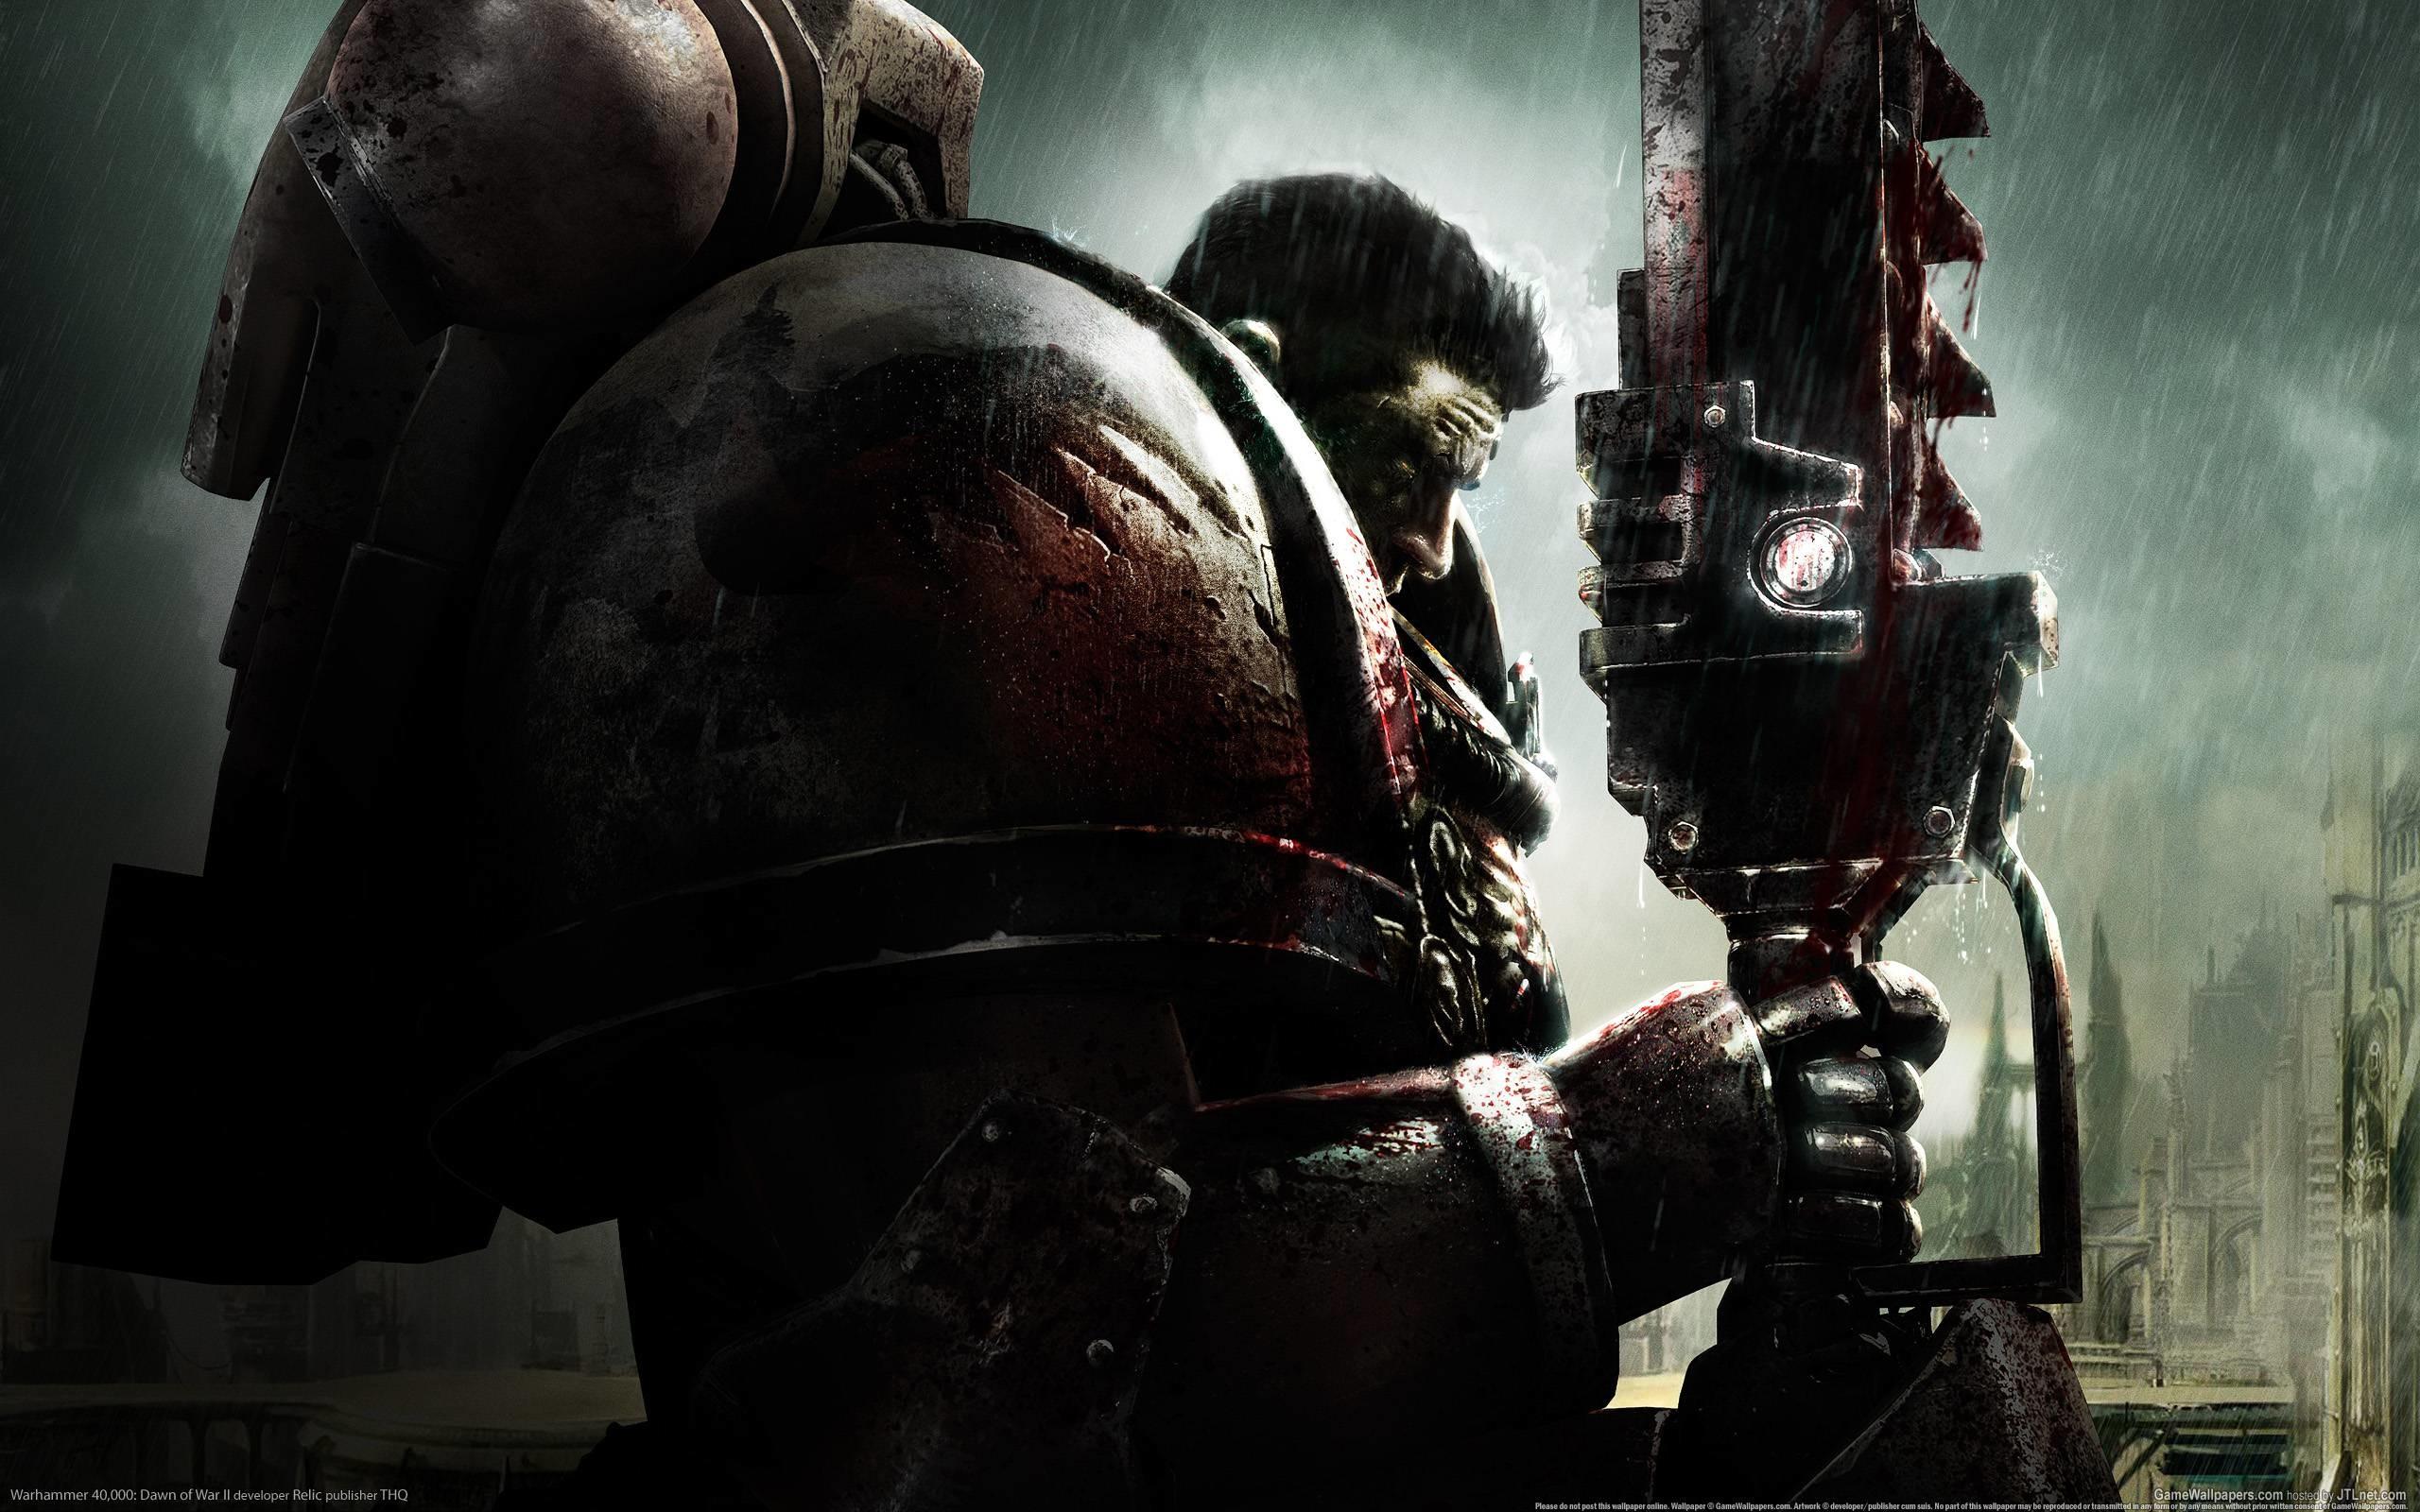 <b>Warhammer 40K HD Wallpapers</b> – WallpaperSafari